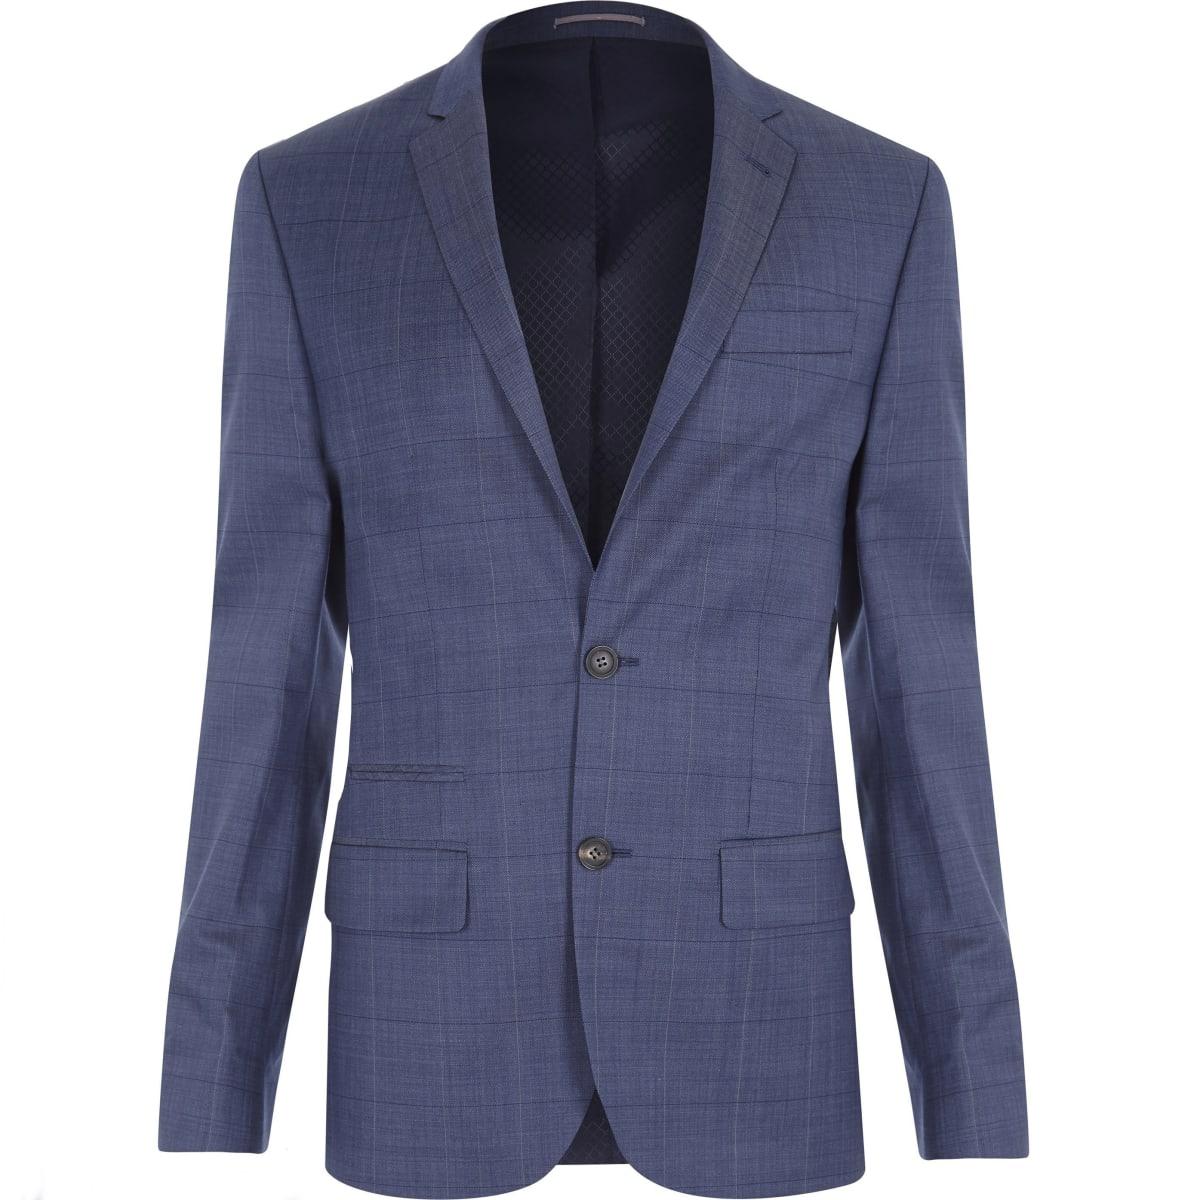 Light navy check slim fit suit jacket